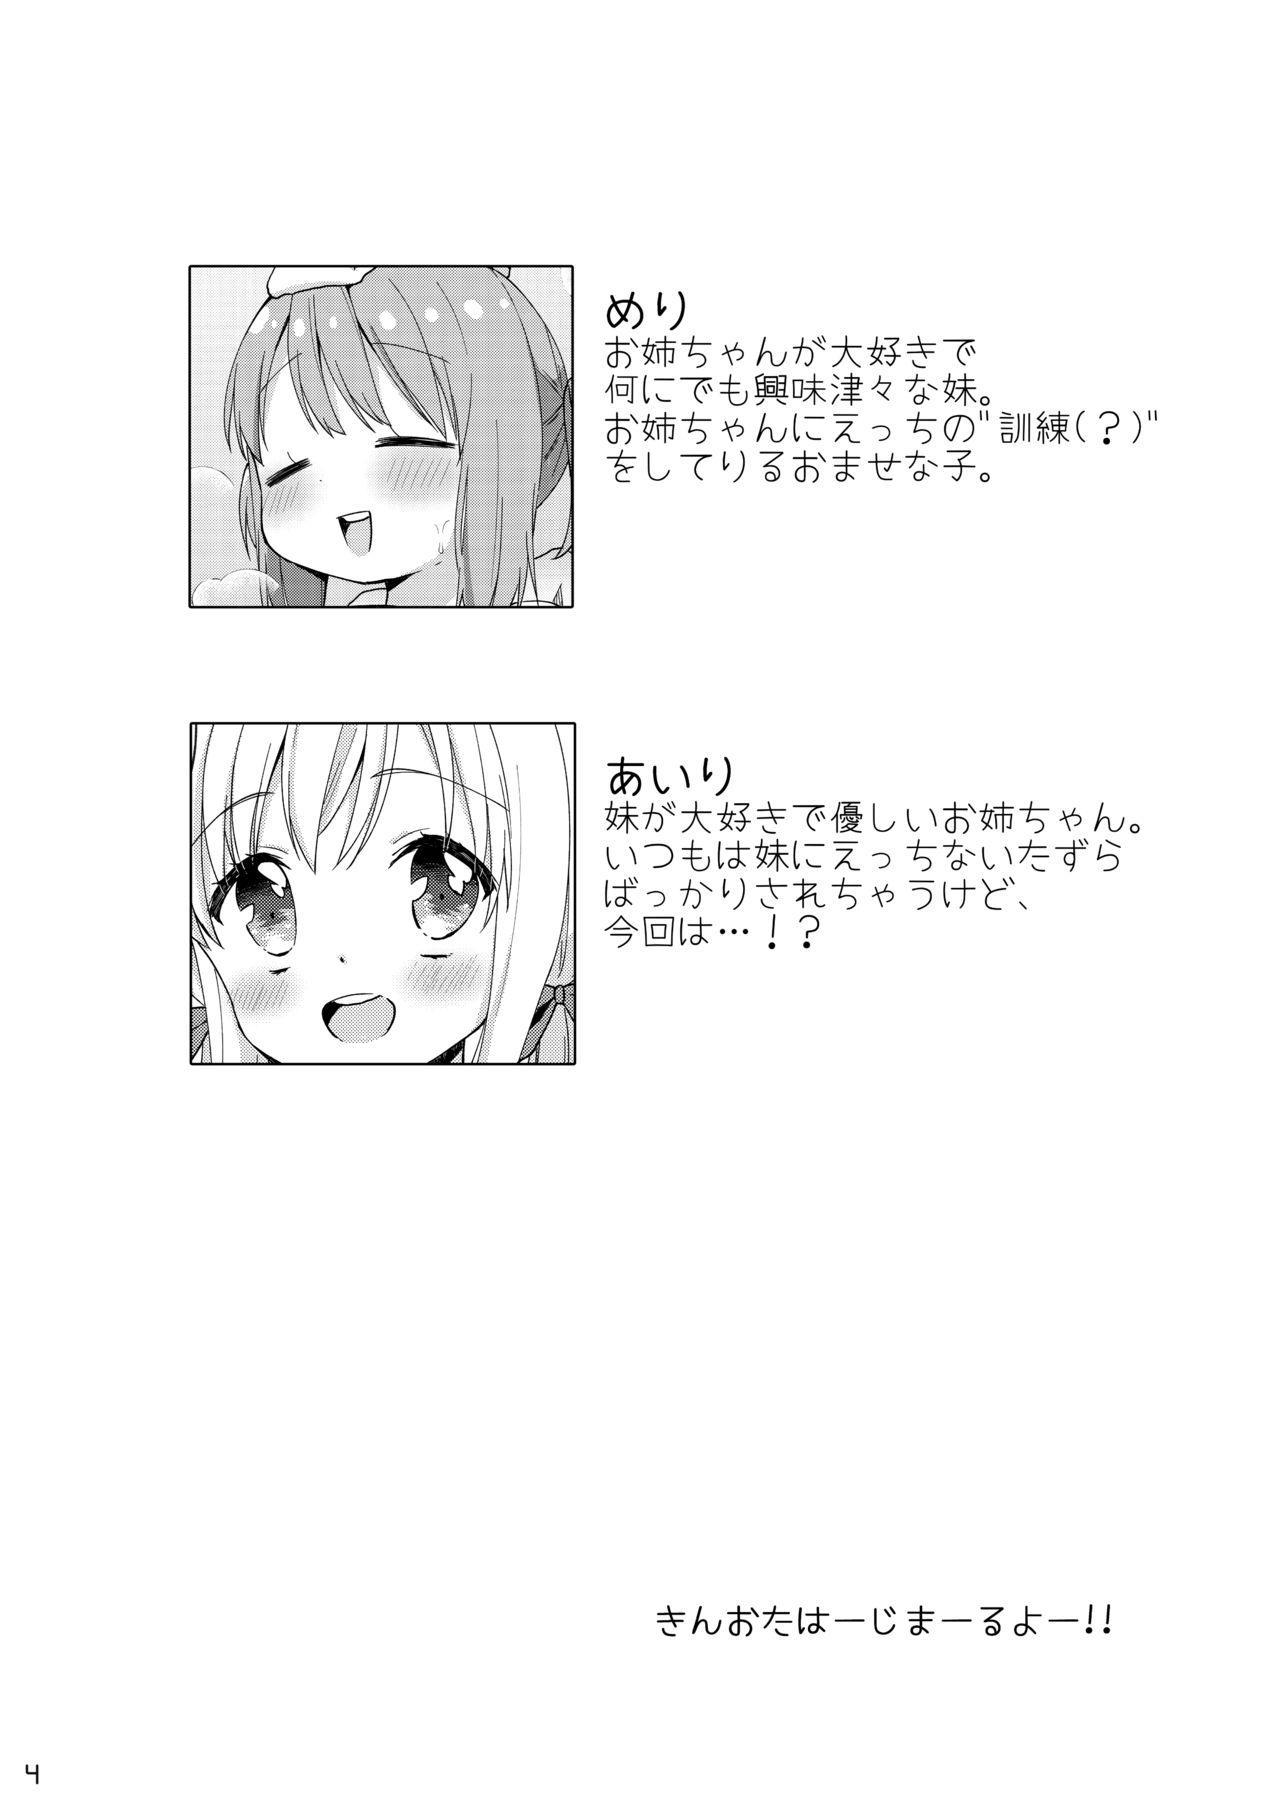 Kinyoubi no Otanoshimi 2